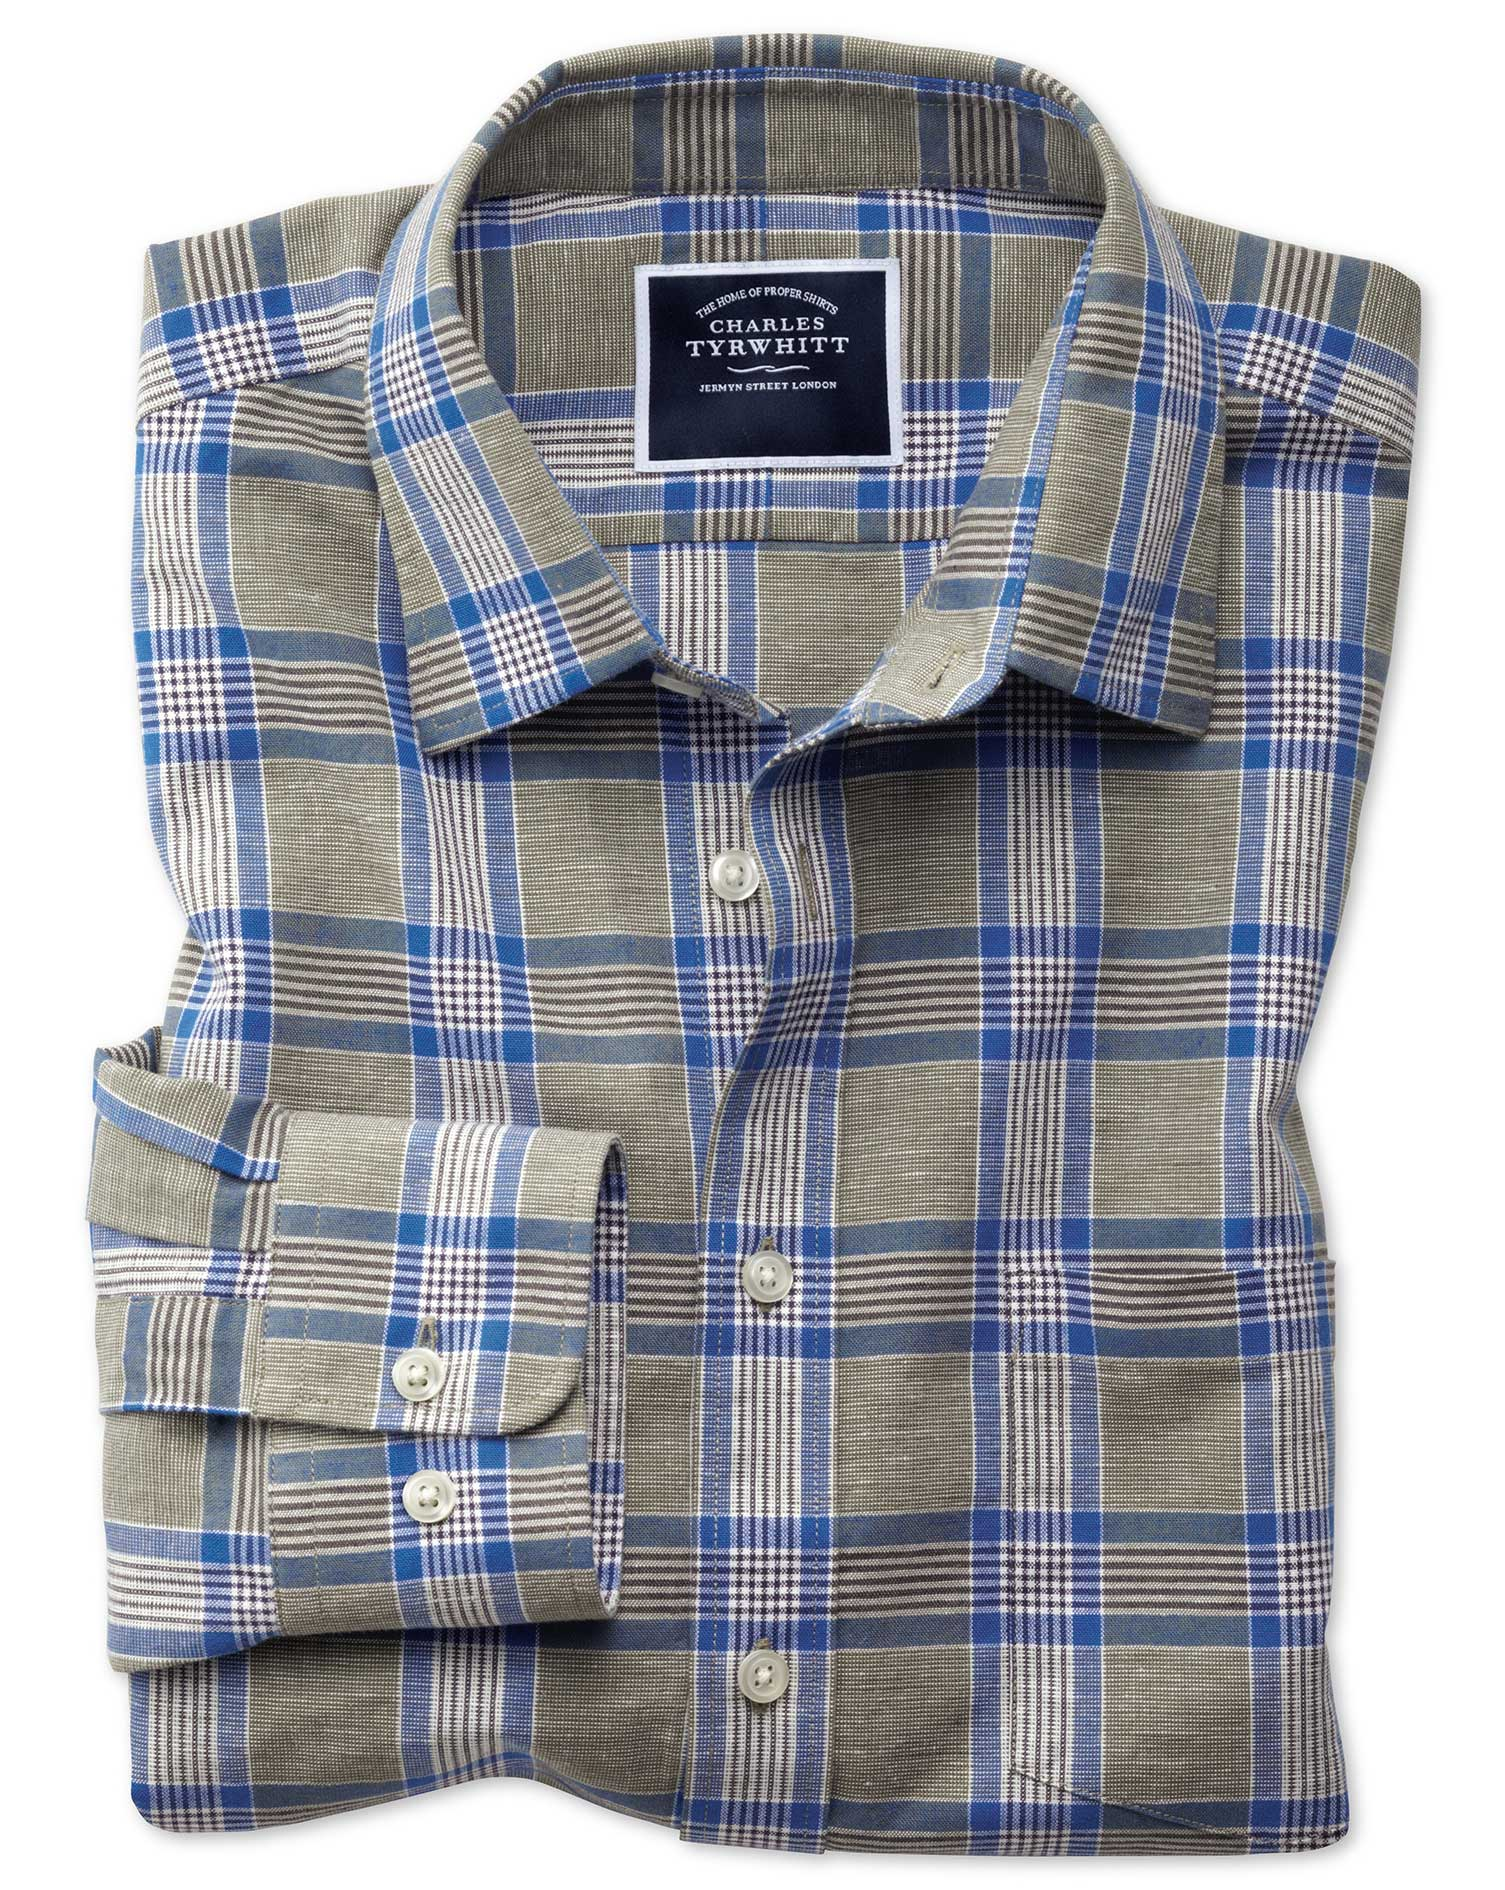 Classic Fit Cotton Linen Khaki Check Shirt Single Cuff Size XXXL by Charles Tyrwhitt